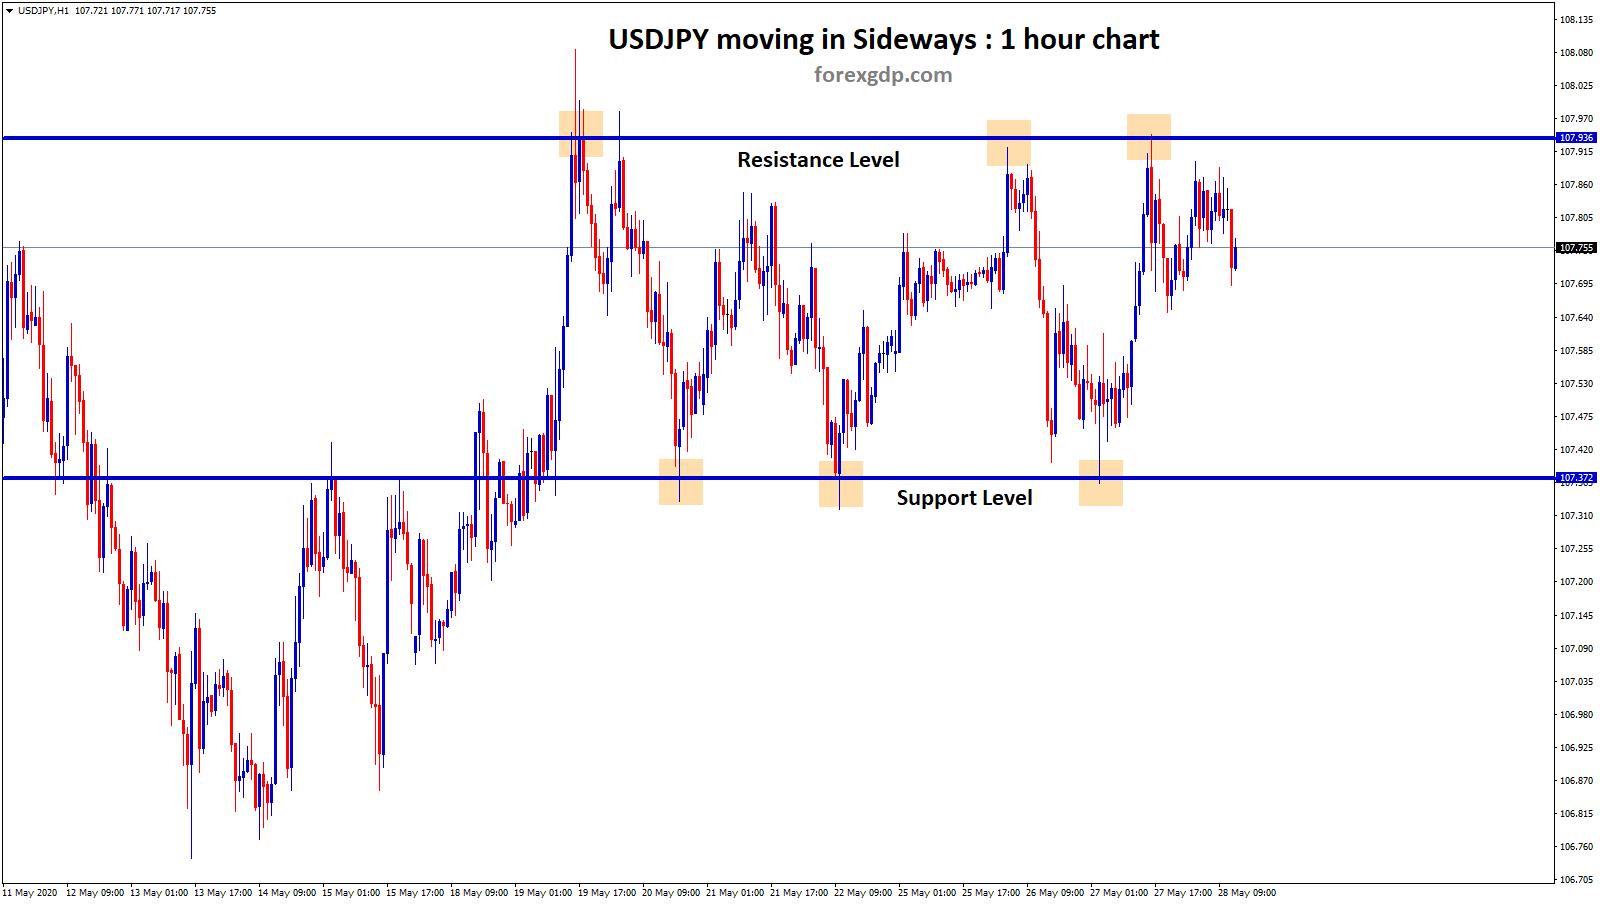 usdjpy moving sideways in 1hr chart